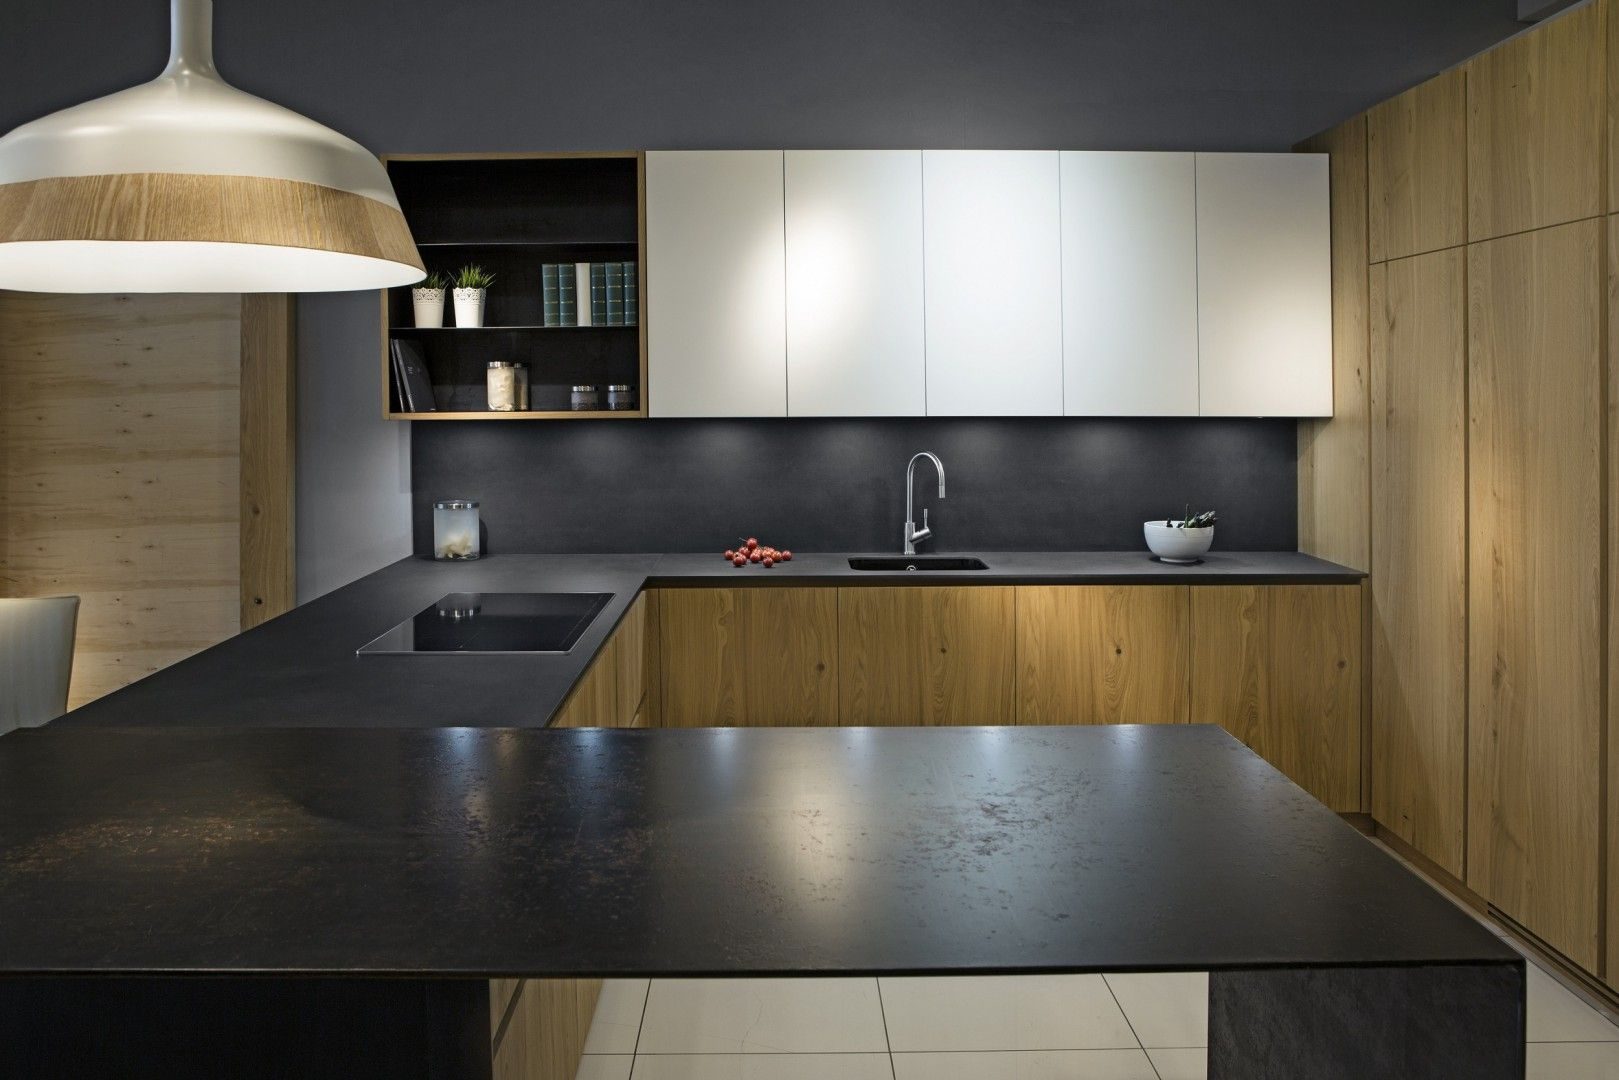 Blat Z Kolekcji Calce Nero Wloskiej Marki Laminam Fot Laminam Home Decor Home Furniture